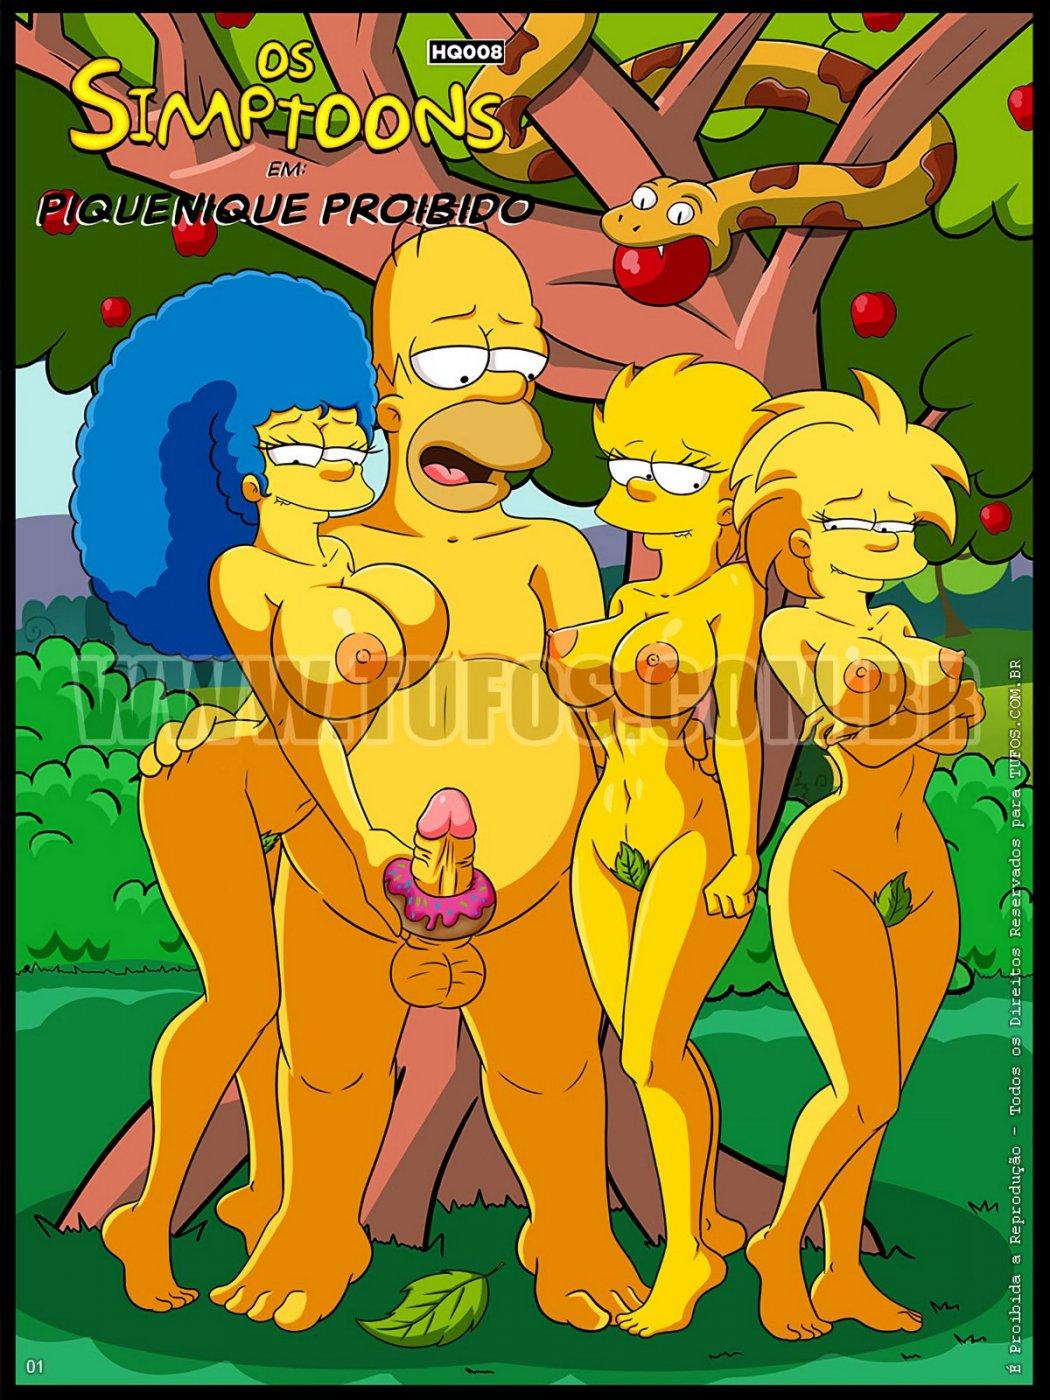 3D Porno Simpson the simpsons - forbidden picnic porn comic - the best